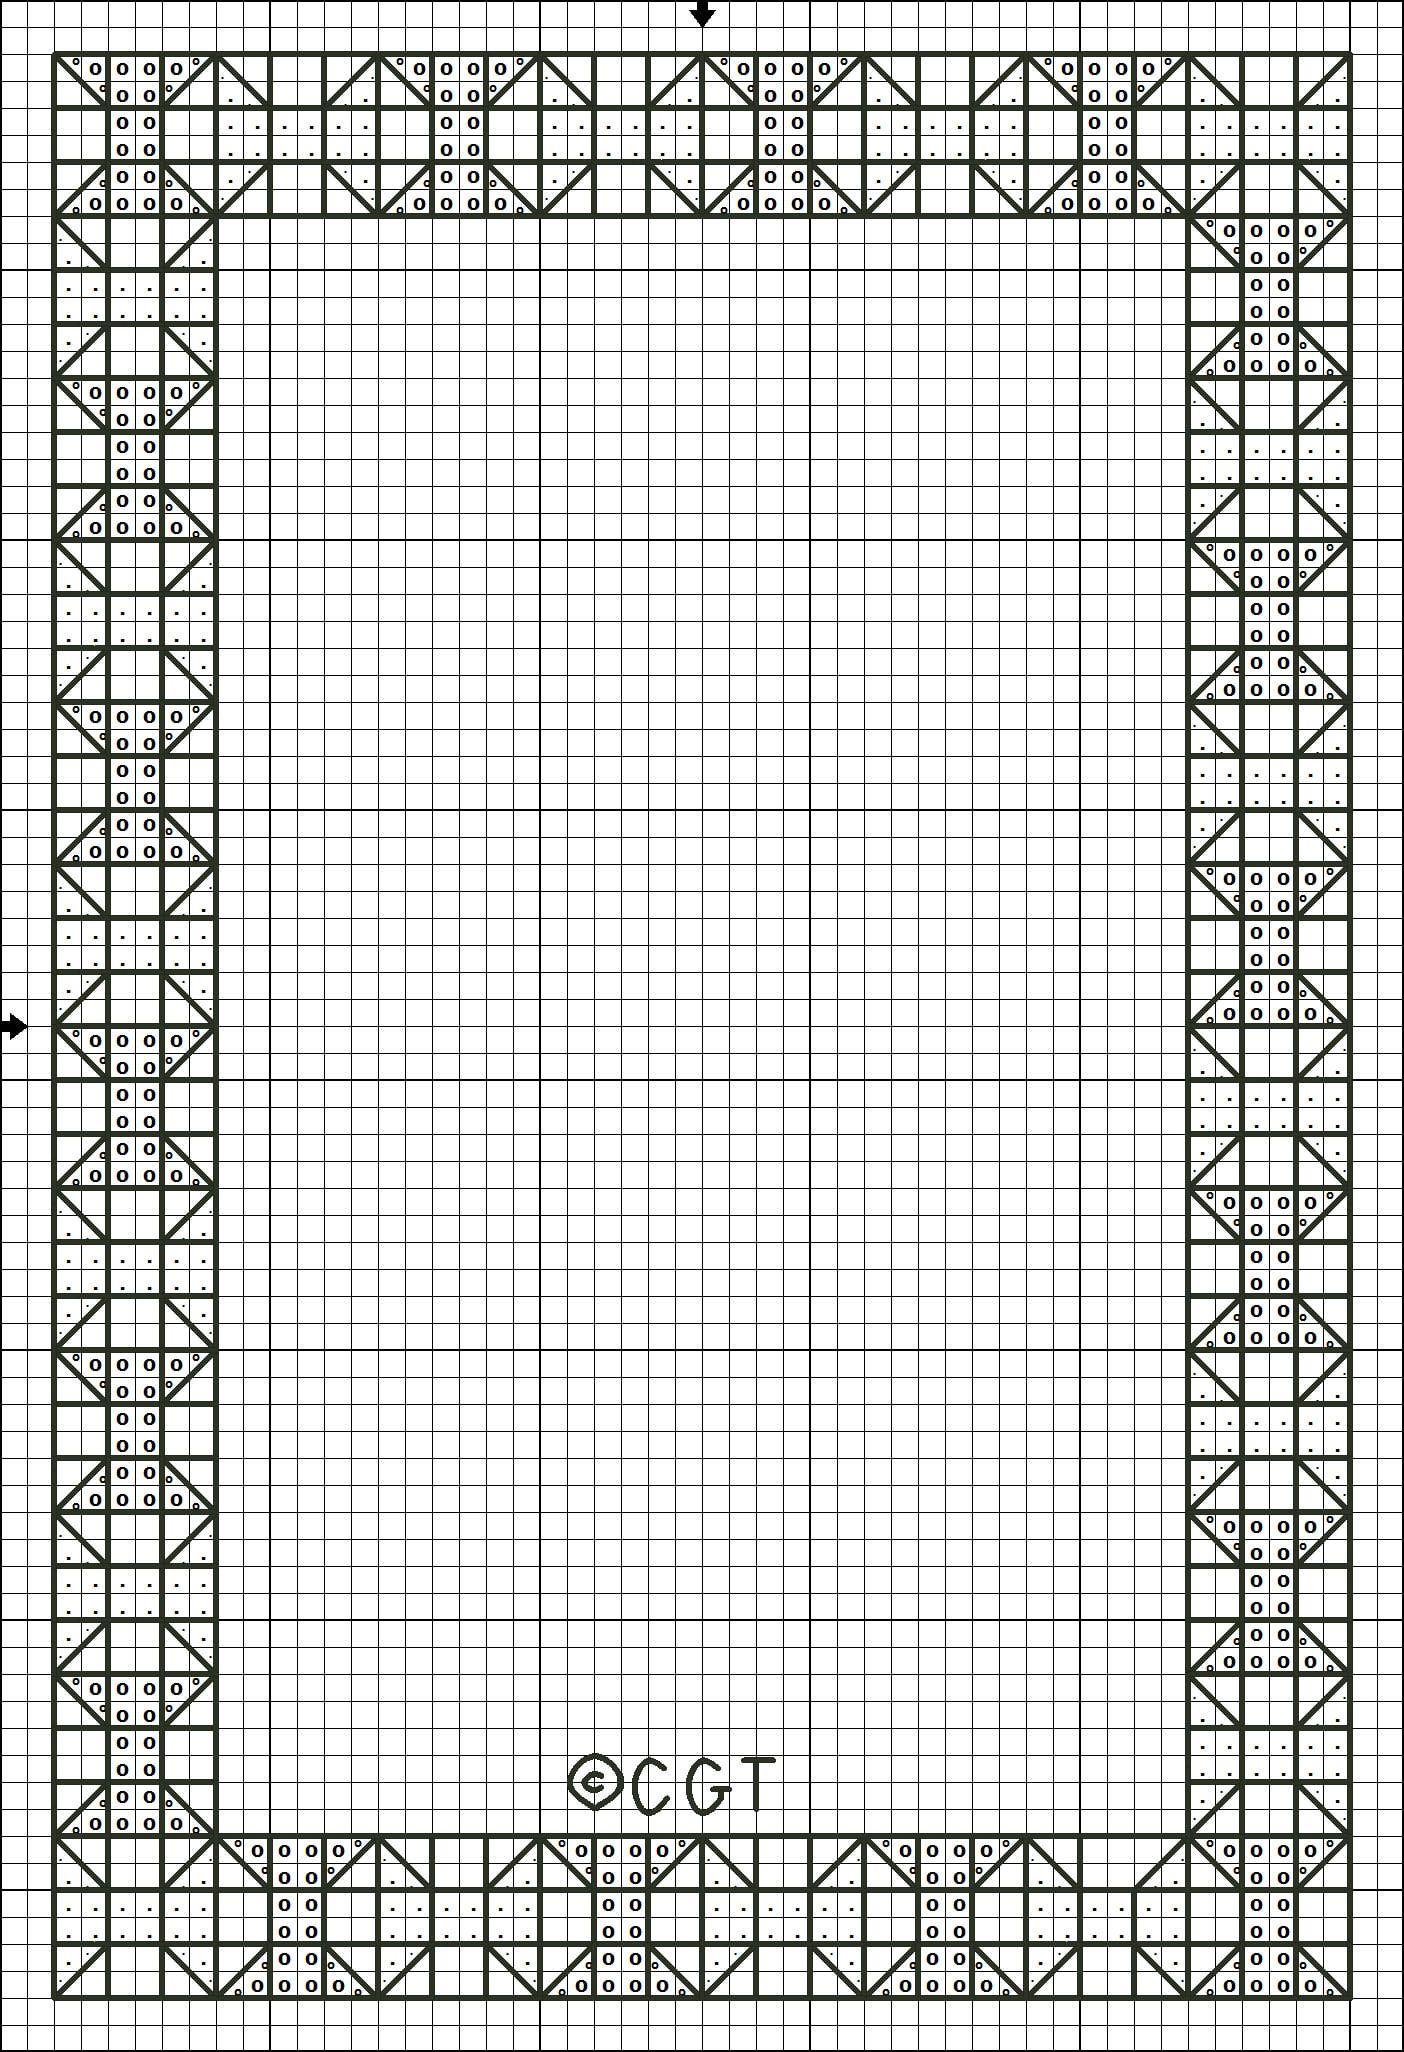 Free Printable Cross Stitch Patterns |  Cross Stitch Border - Free Printable Cross Patterns